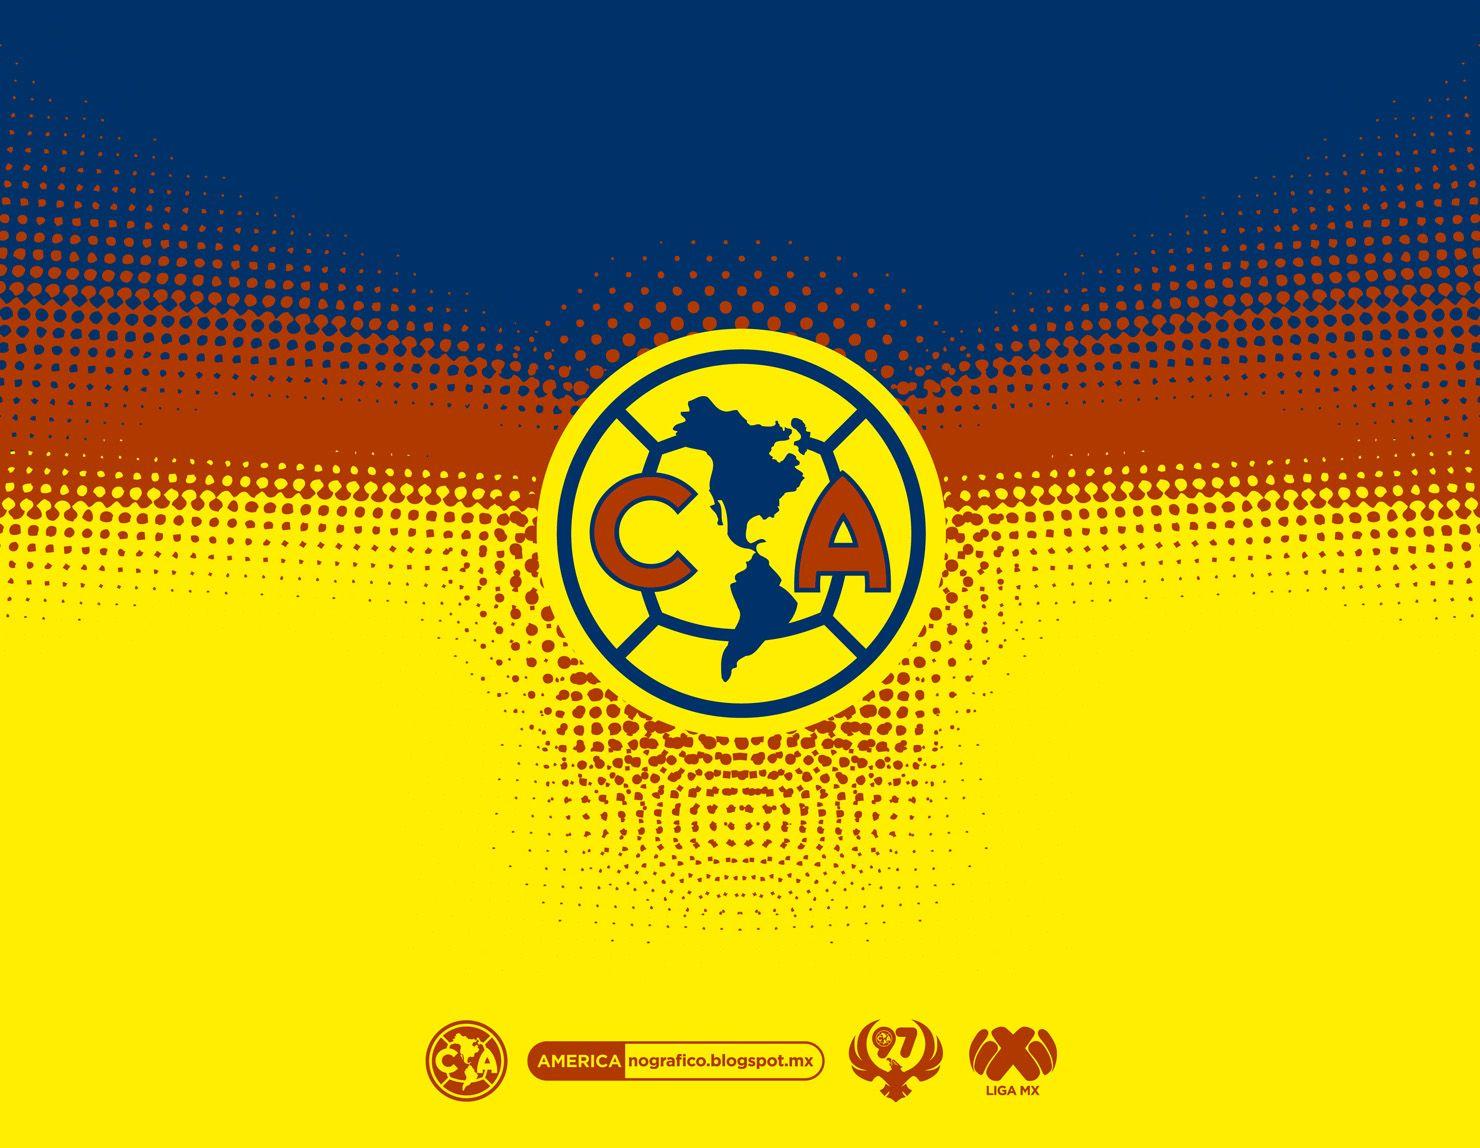 Wallpaper 10072013CTG1 #ClubAmérica #AMERICAnografico